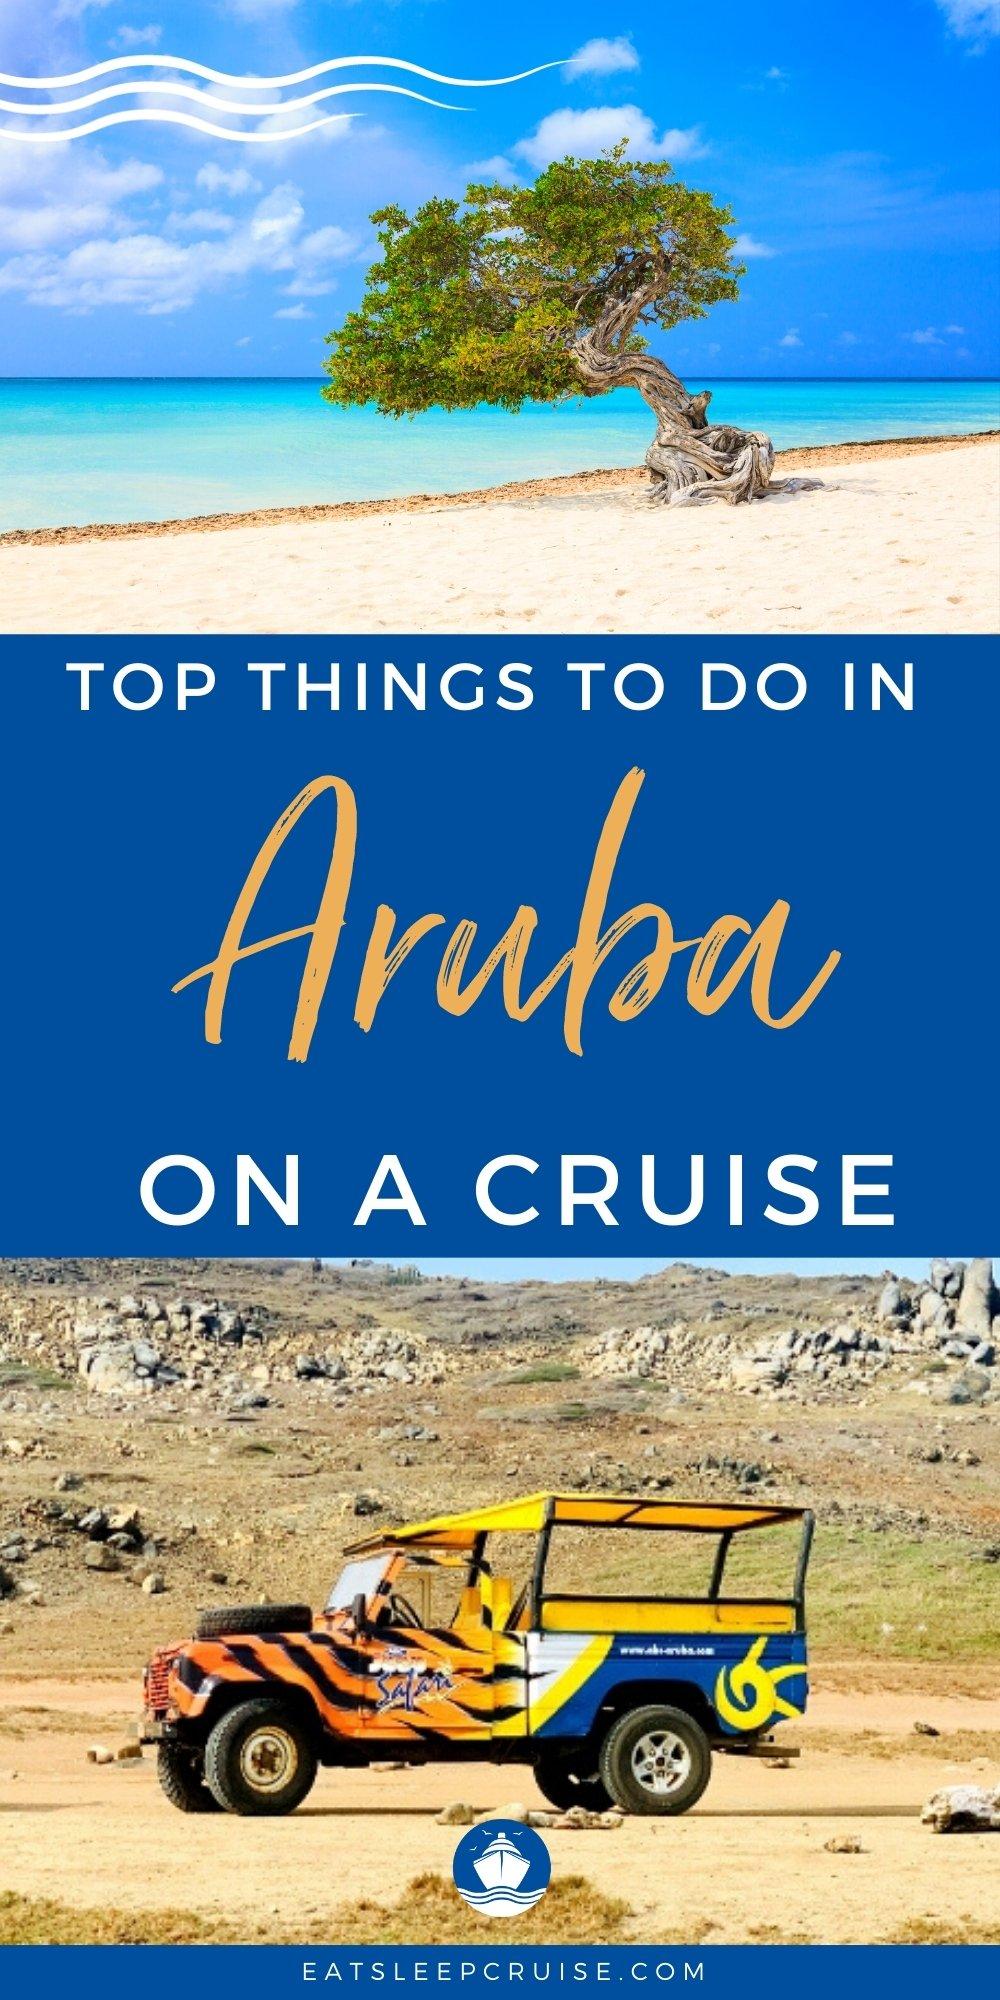 Top Things to Do in Aruba